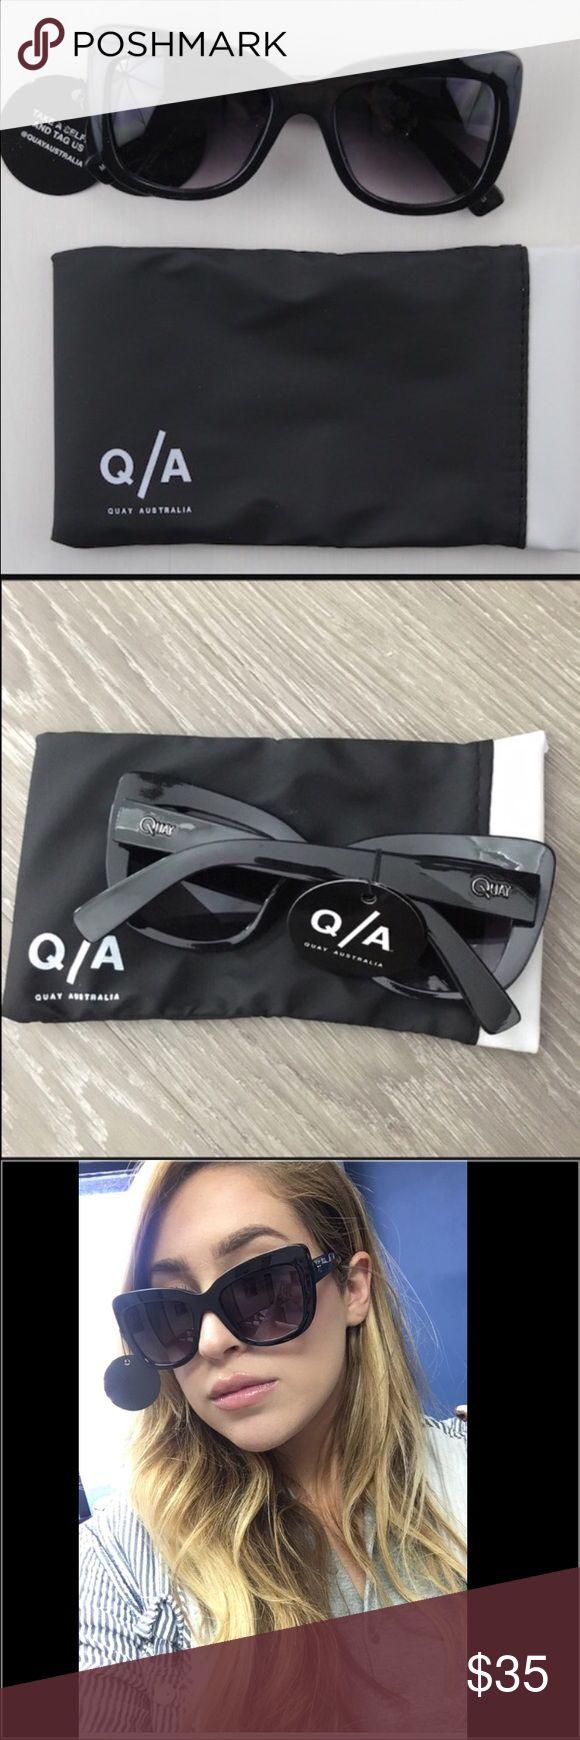 Quay Australian Sunglasses Quay Australian Sunglasses.  NWT.  Love this pair from Quay!  Perfect cat eye and smokey gray lenses. Quay Australia Accessories Glasses